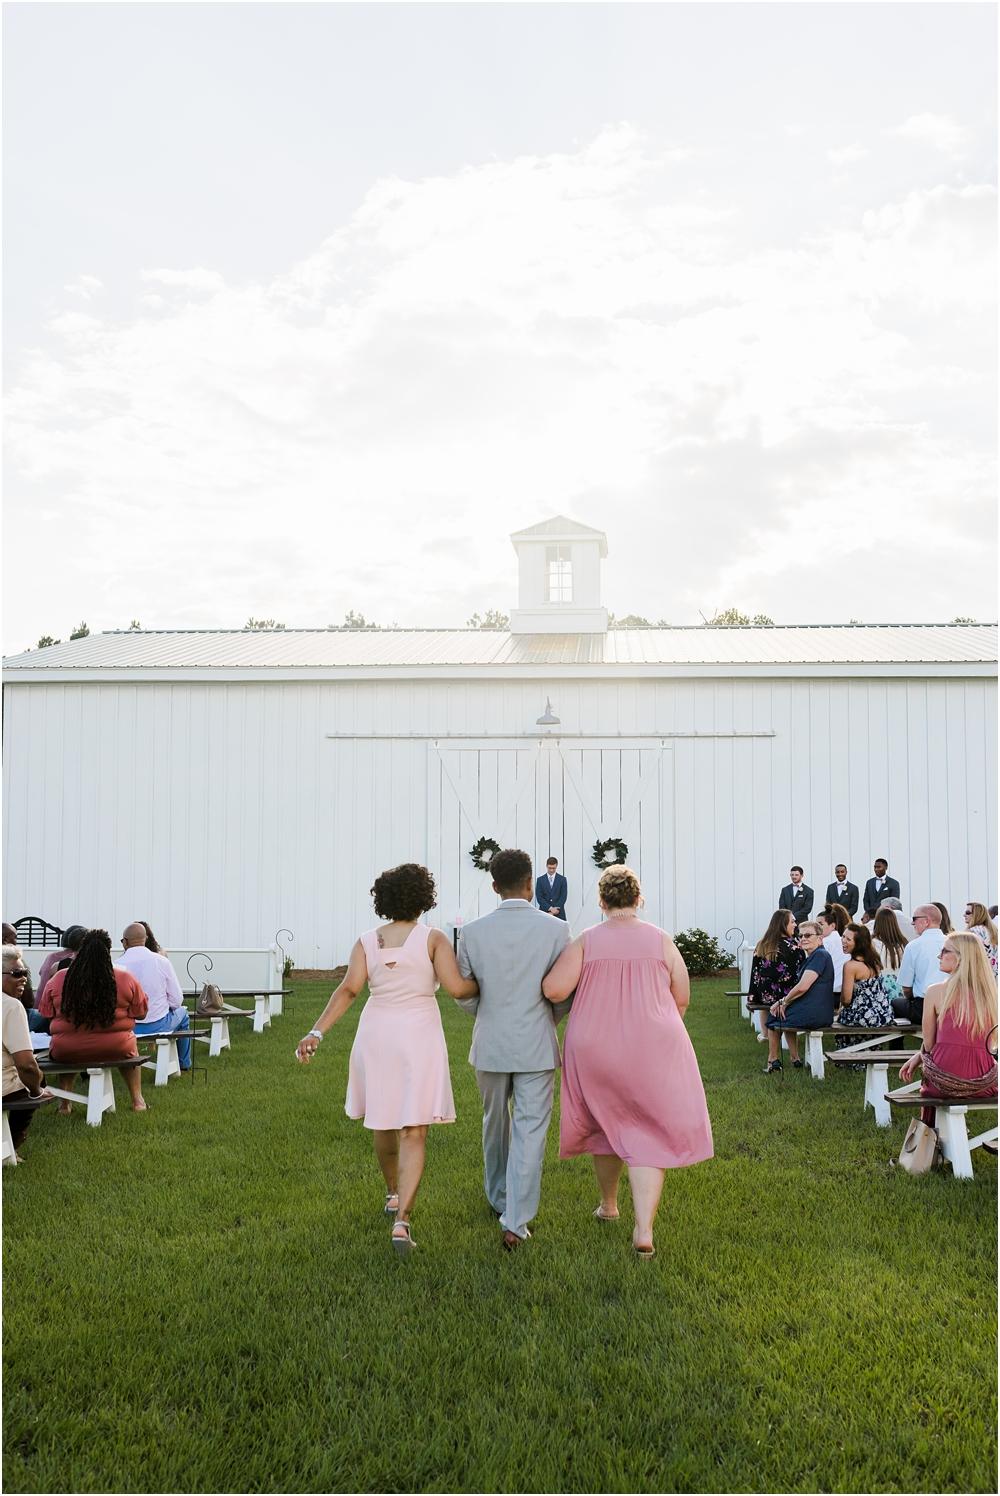 mosley-wedding-kiersten-stevenson-photography-30a-panama-city-beach-dothan-tallahassee-(110-of-472).JPG